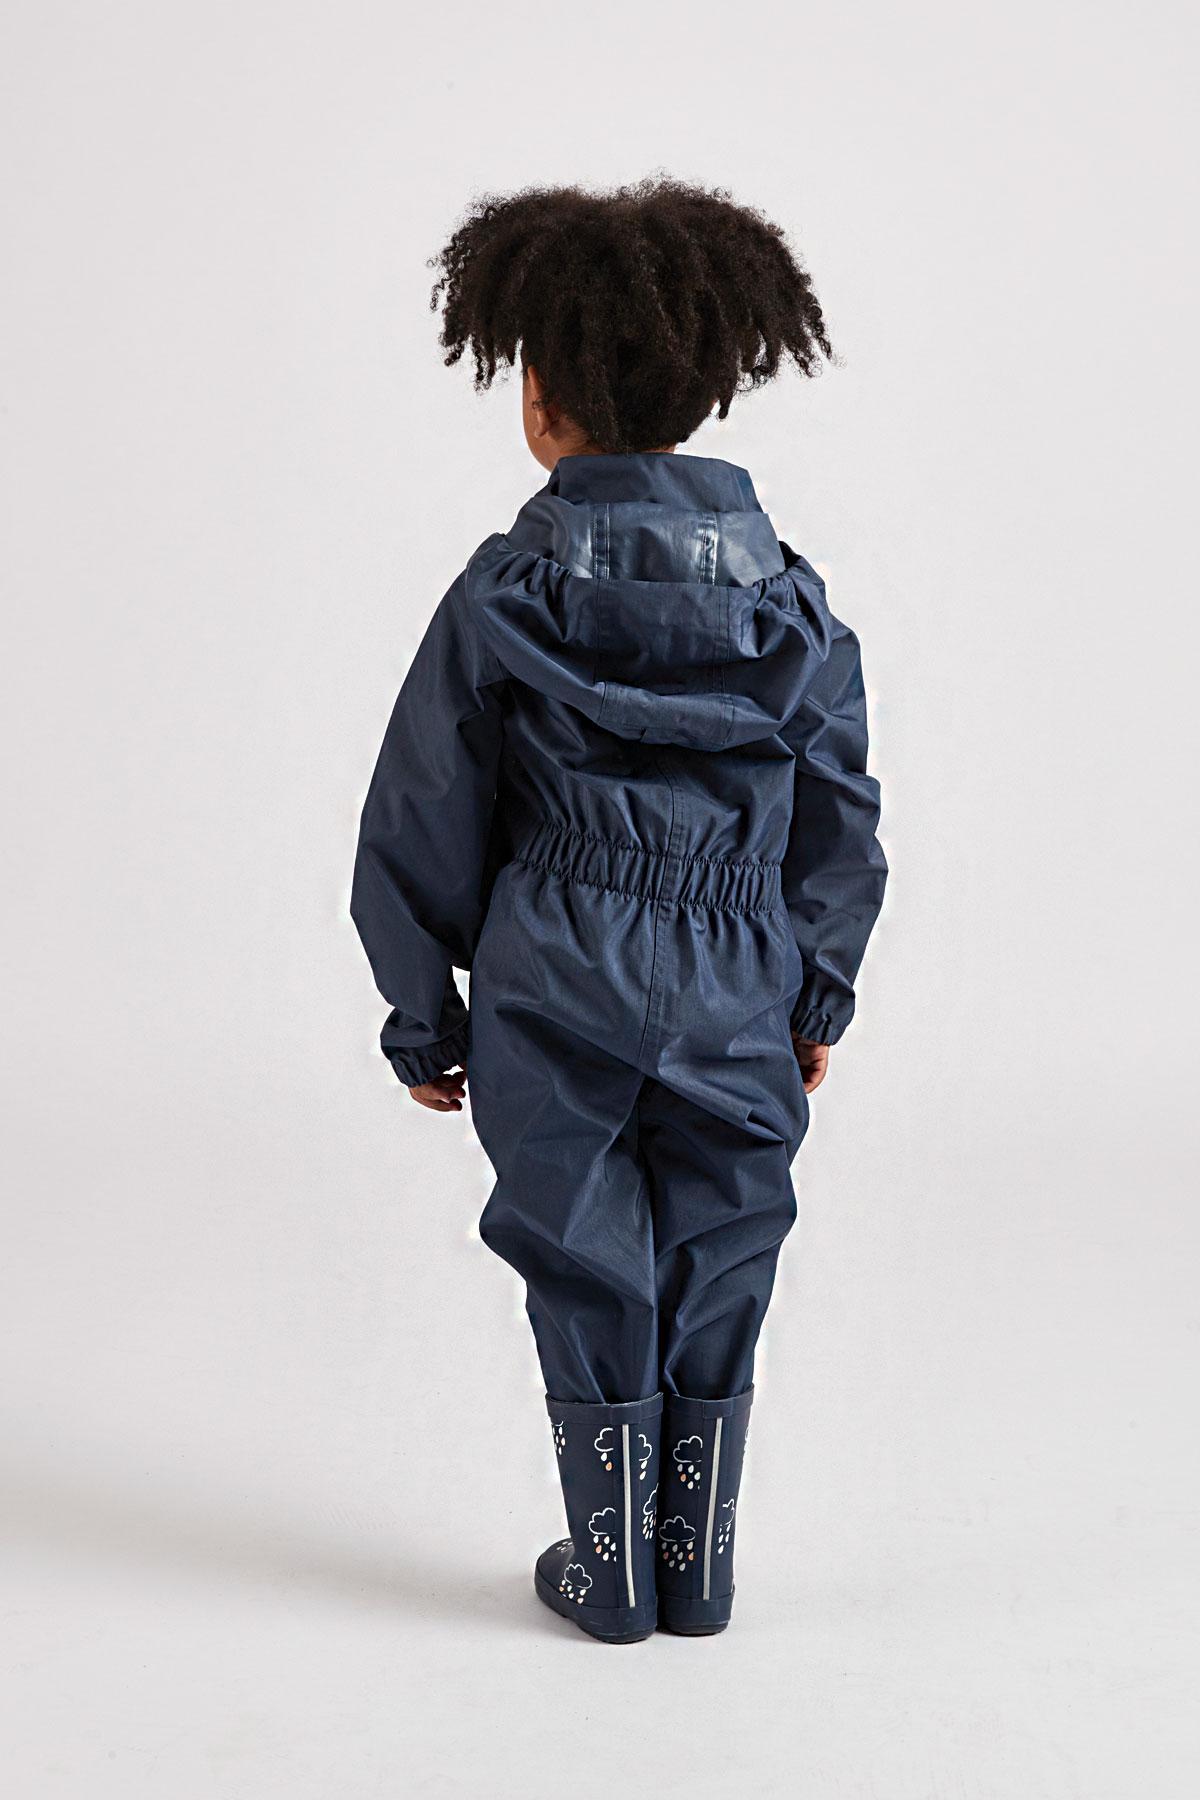 children's navy puddle suit: Grass & Air little kids waterproof suit in navy